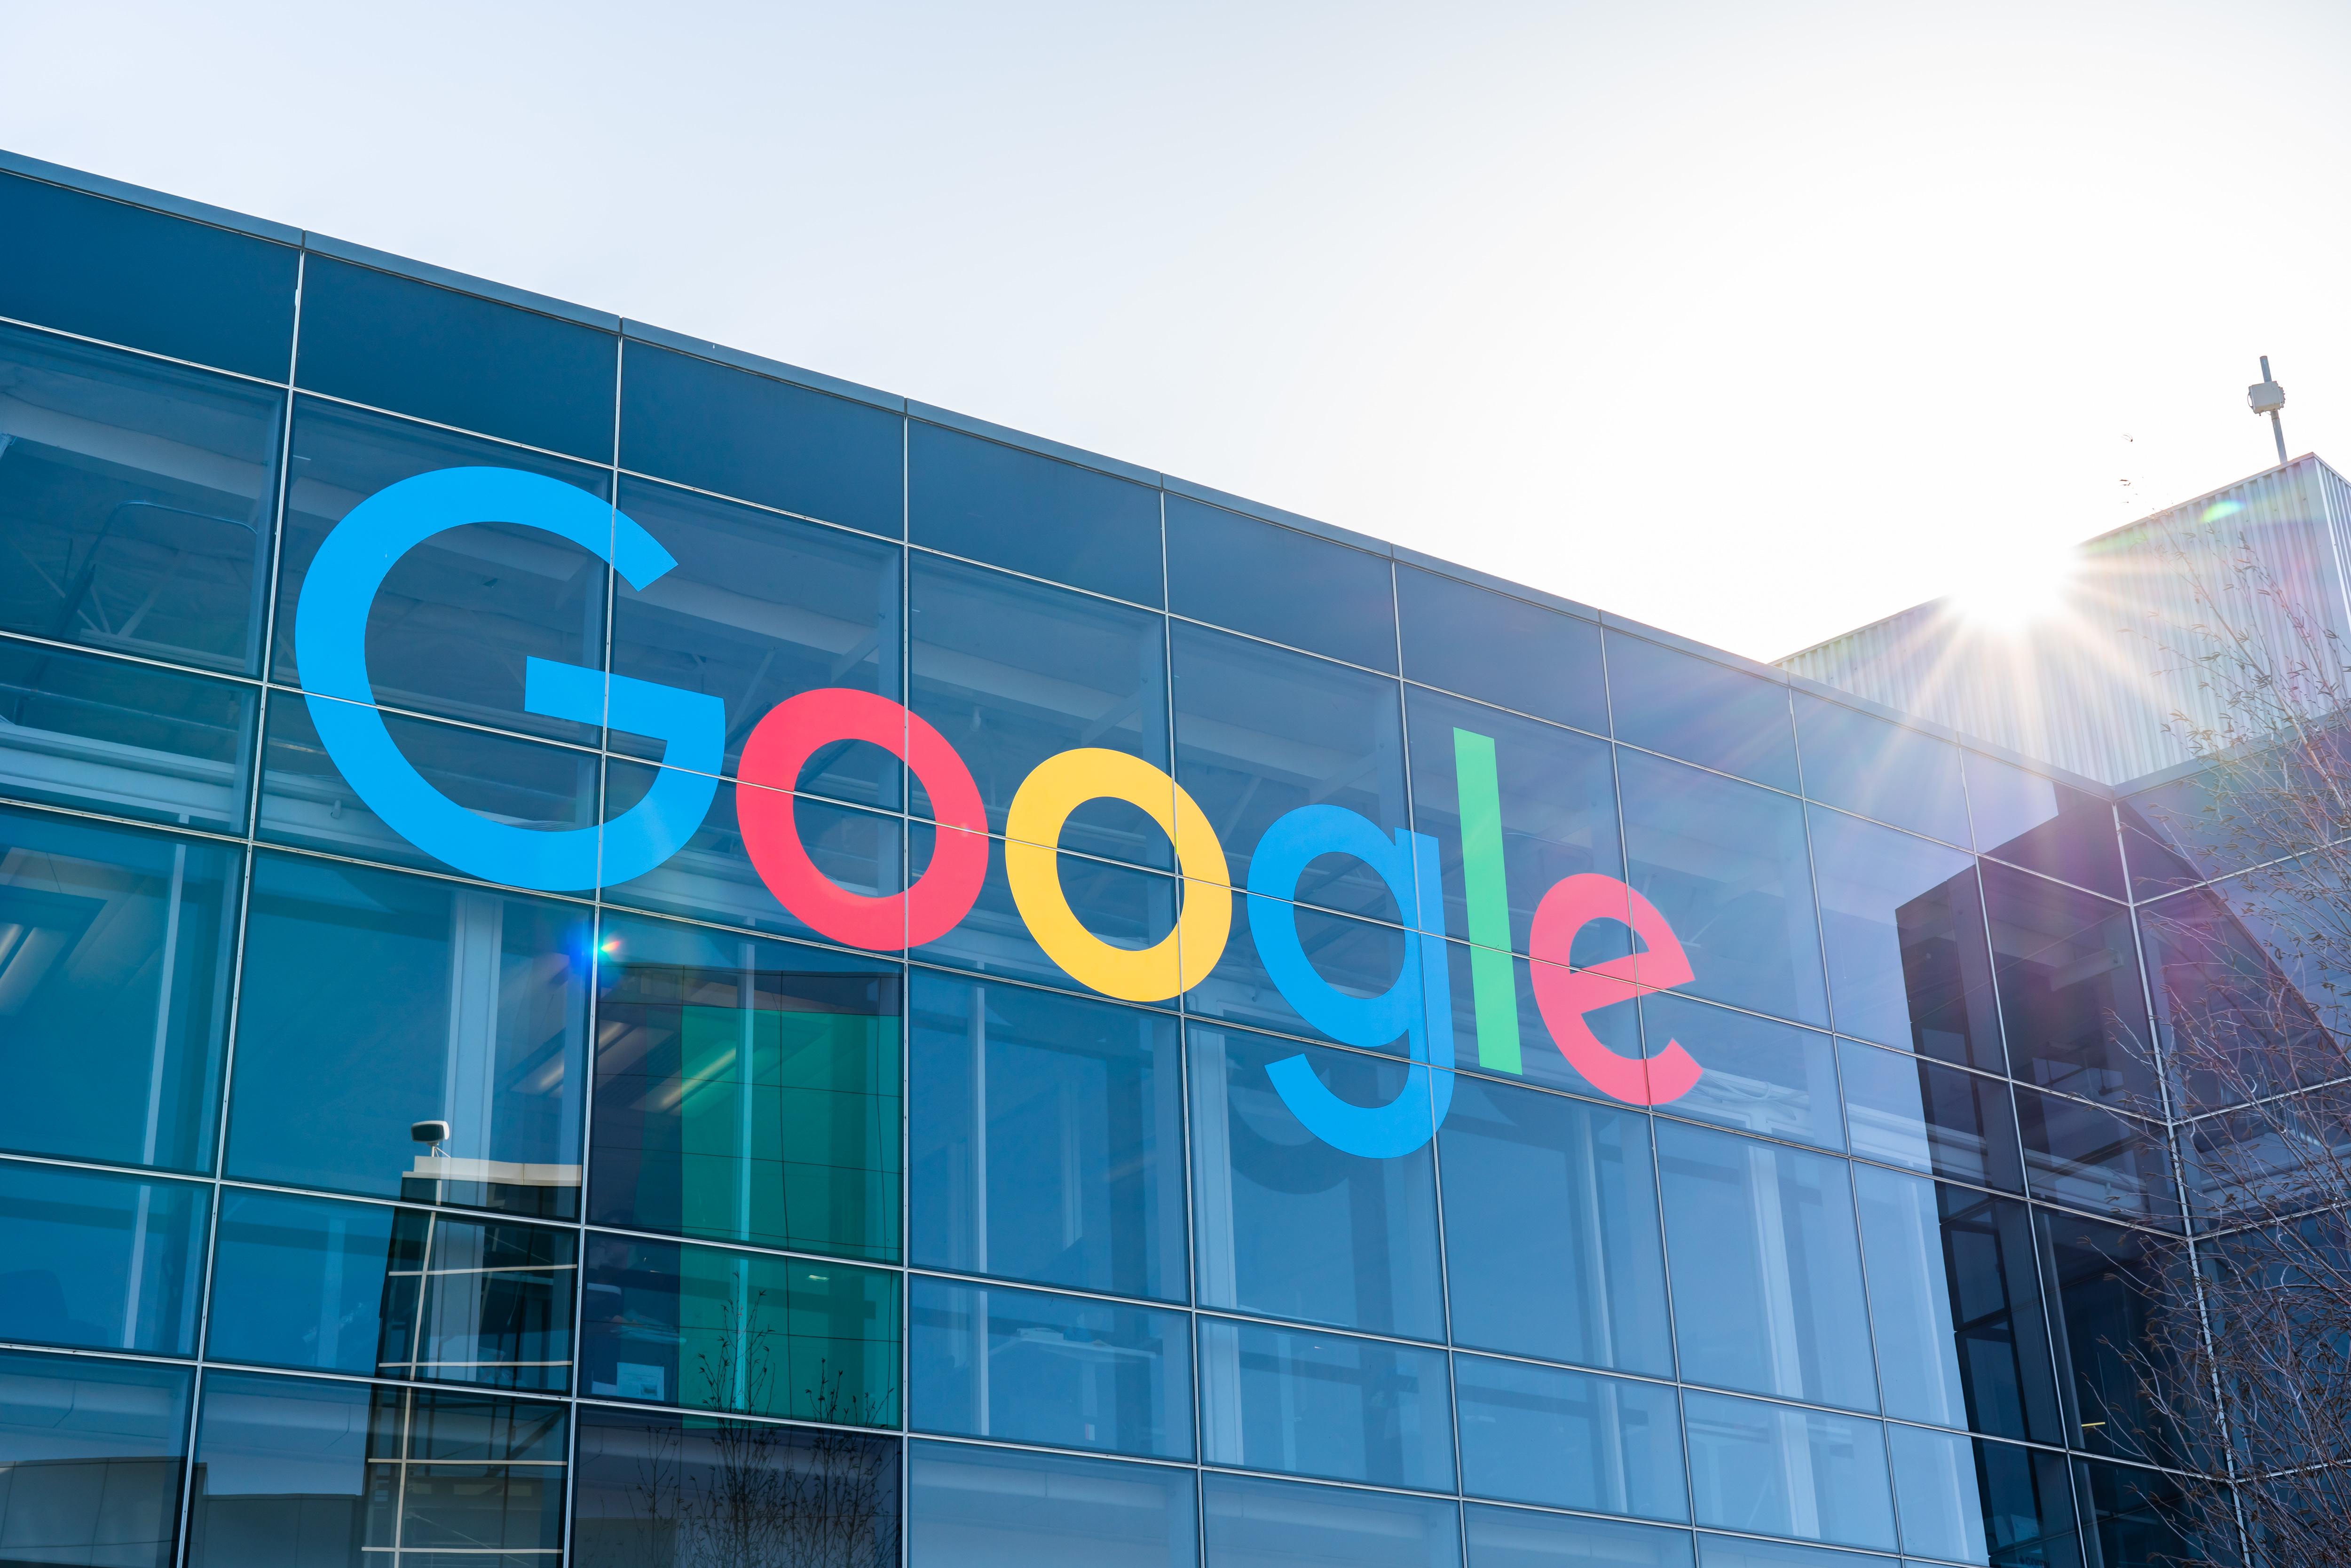 Google will require coronavirus vaccines for returning office employees